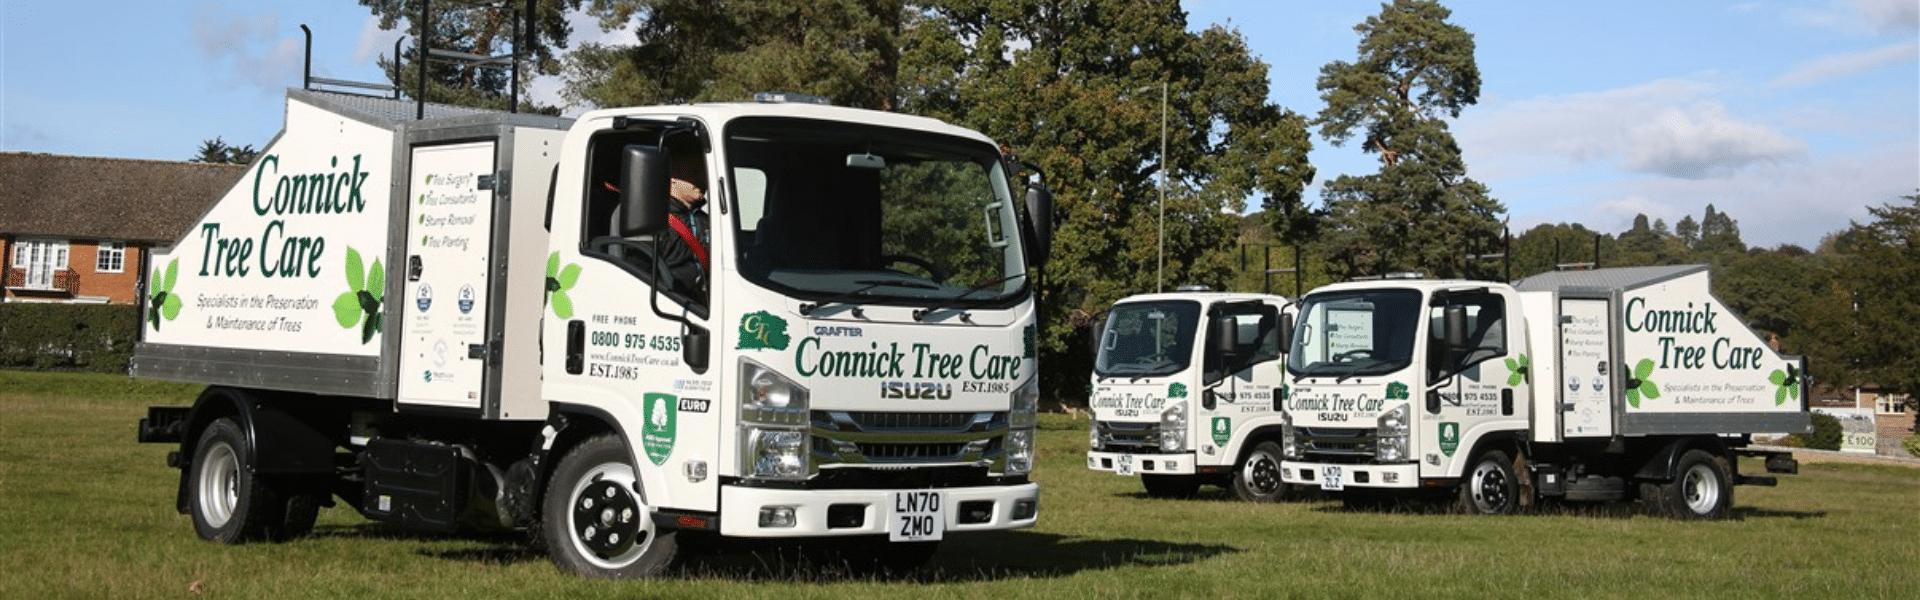 Tree Surgeon in Surrey